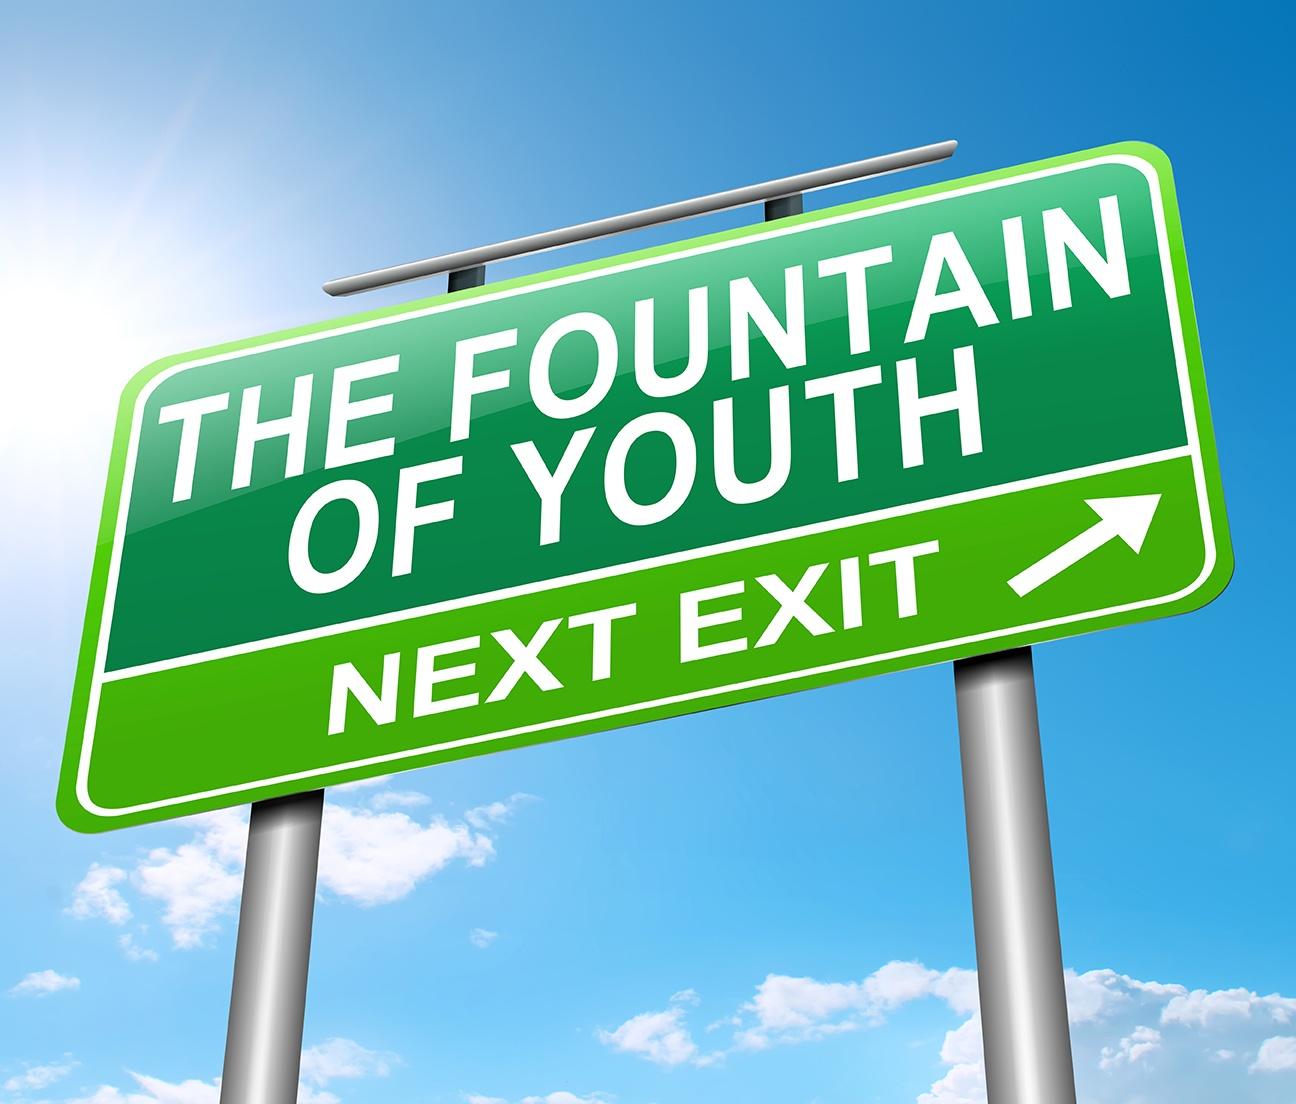 Fountain of youth.jpg